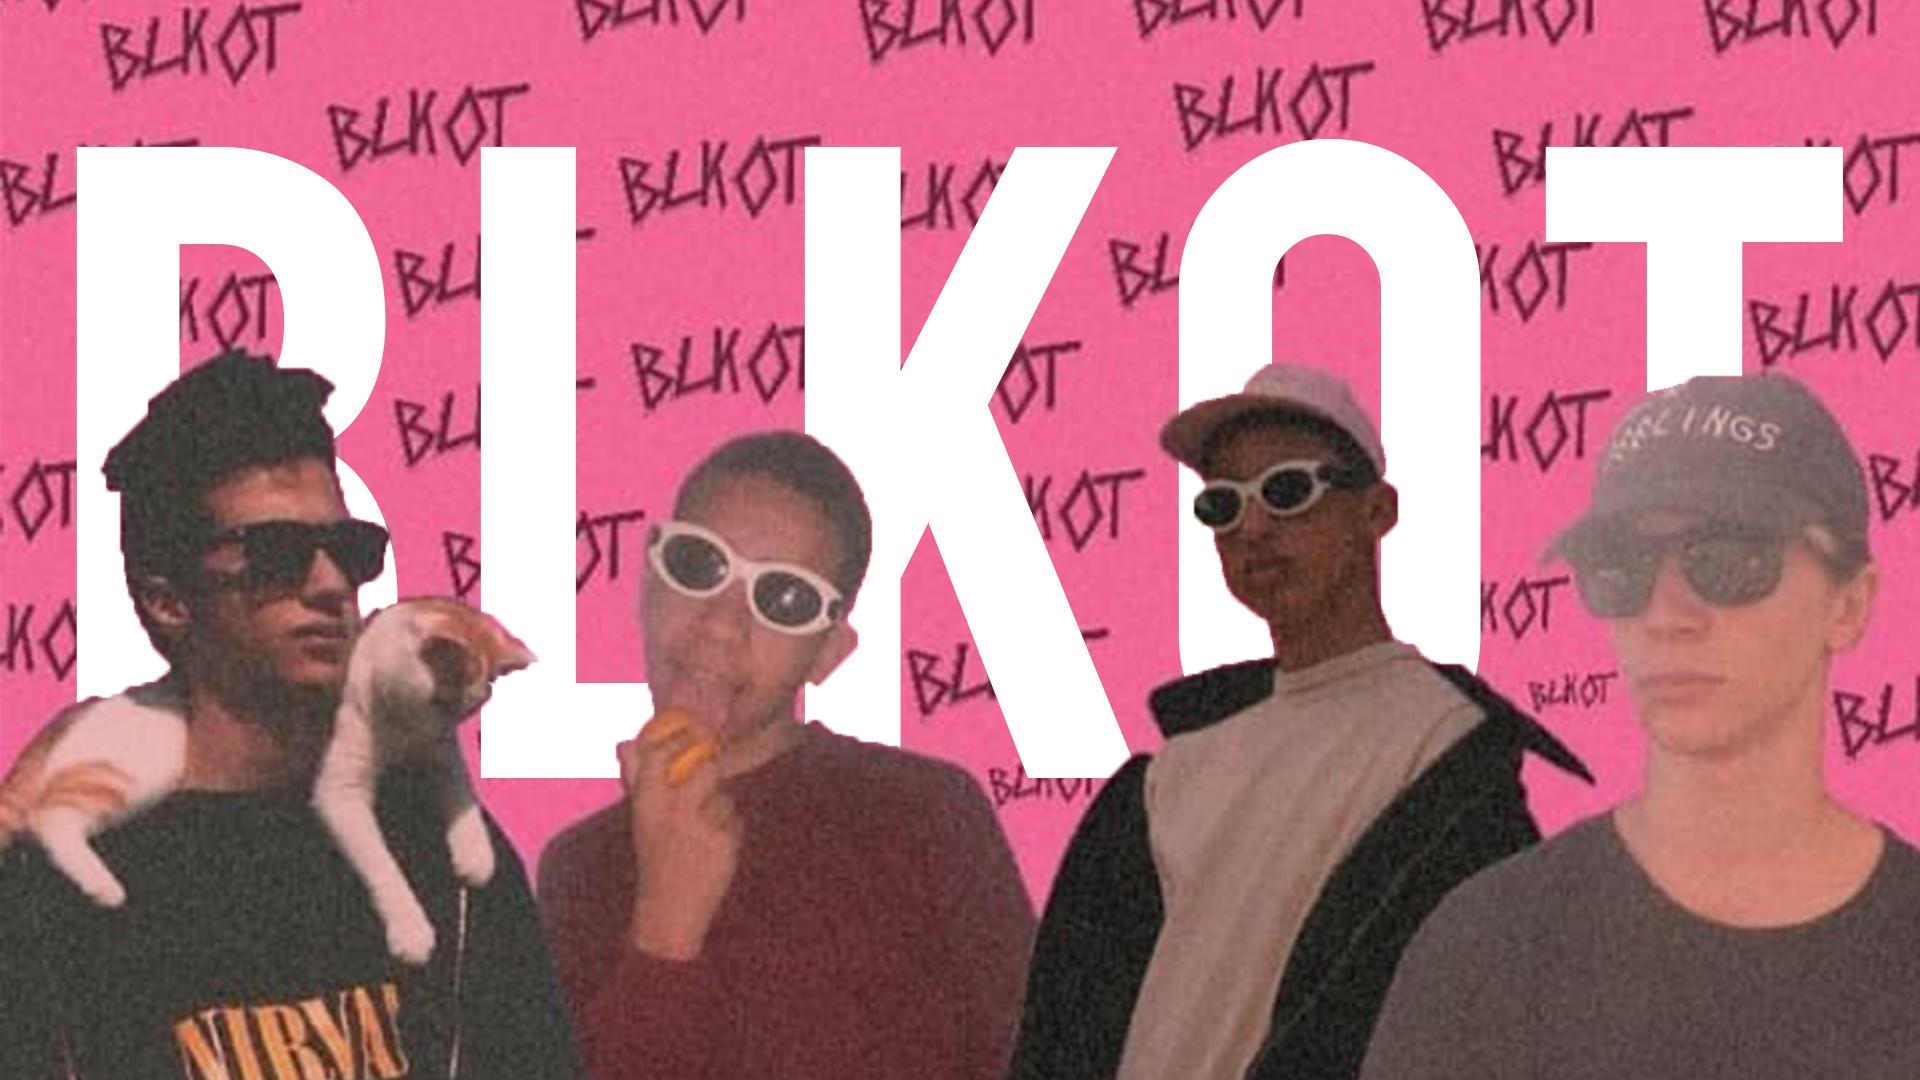 BLKOT : The Tunisian Skateboarding Team